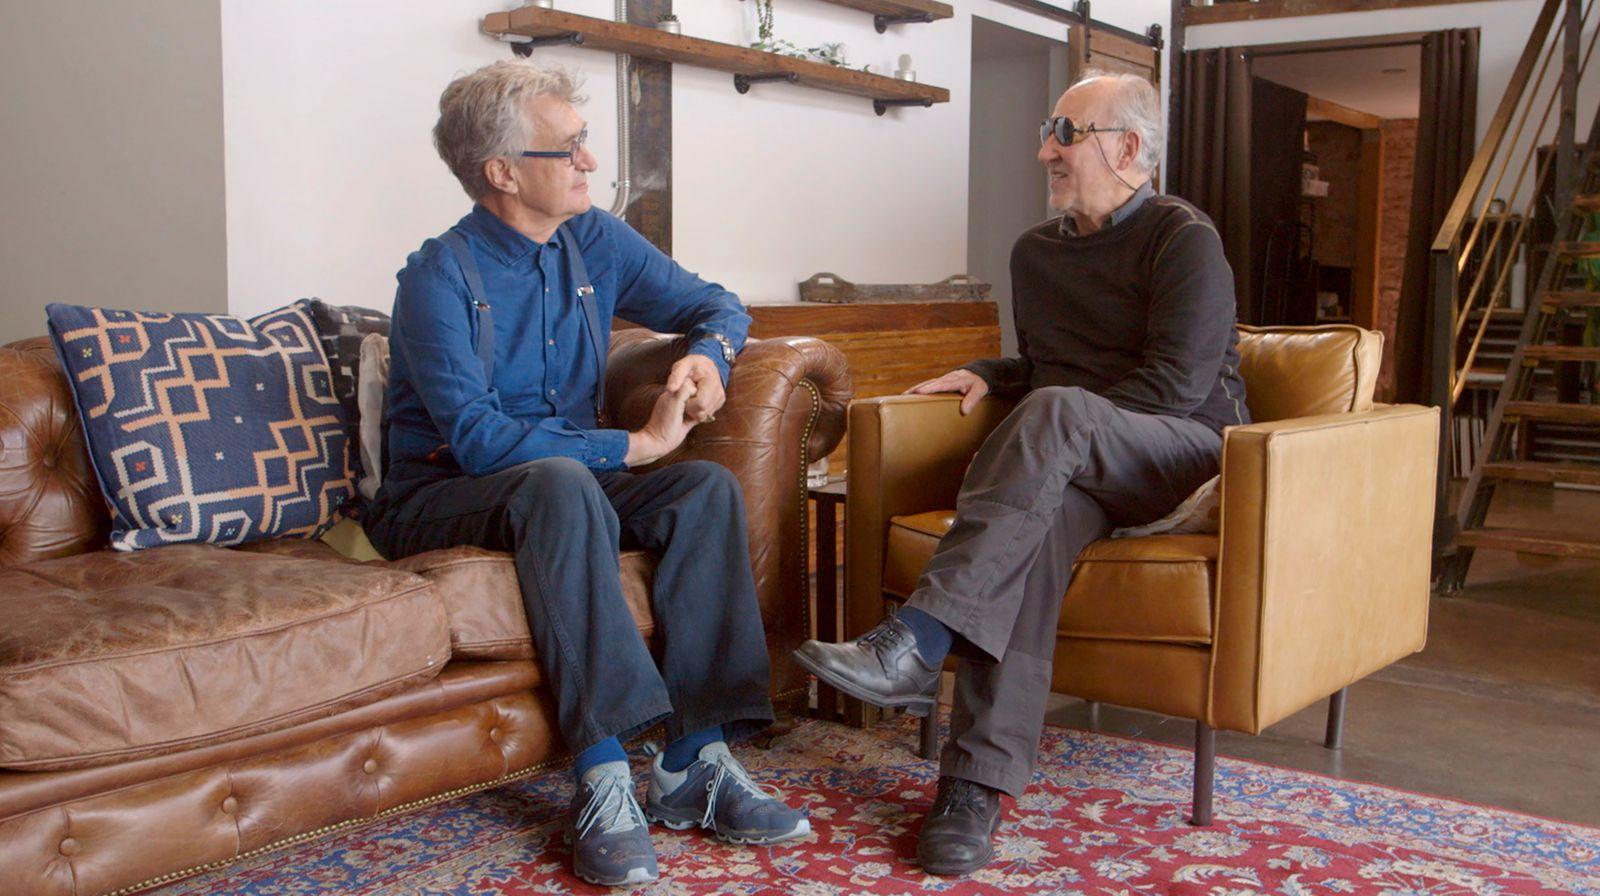 Film/ Wim Wenders - Desperado